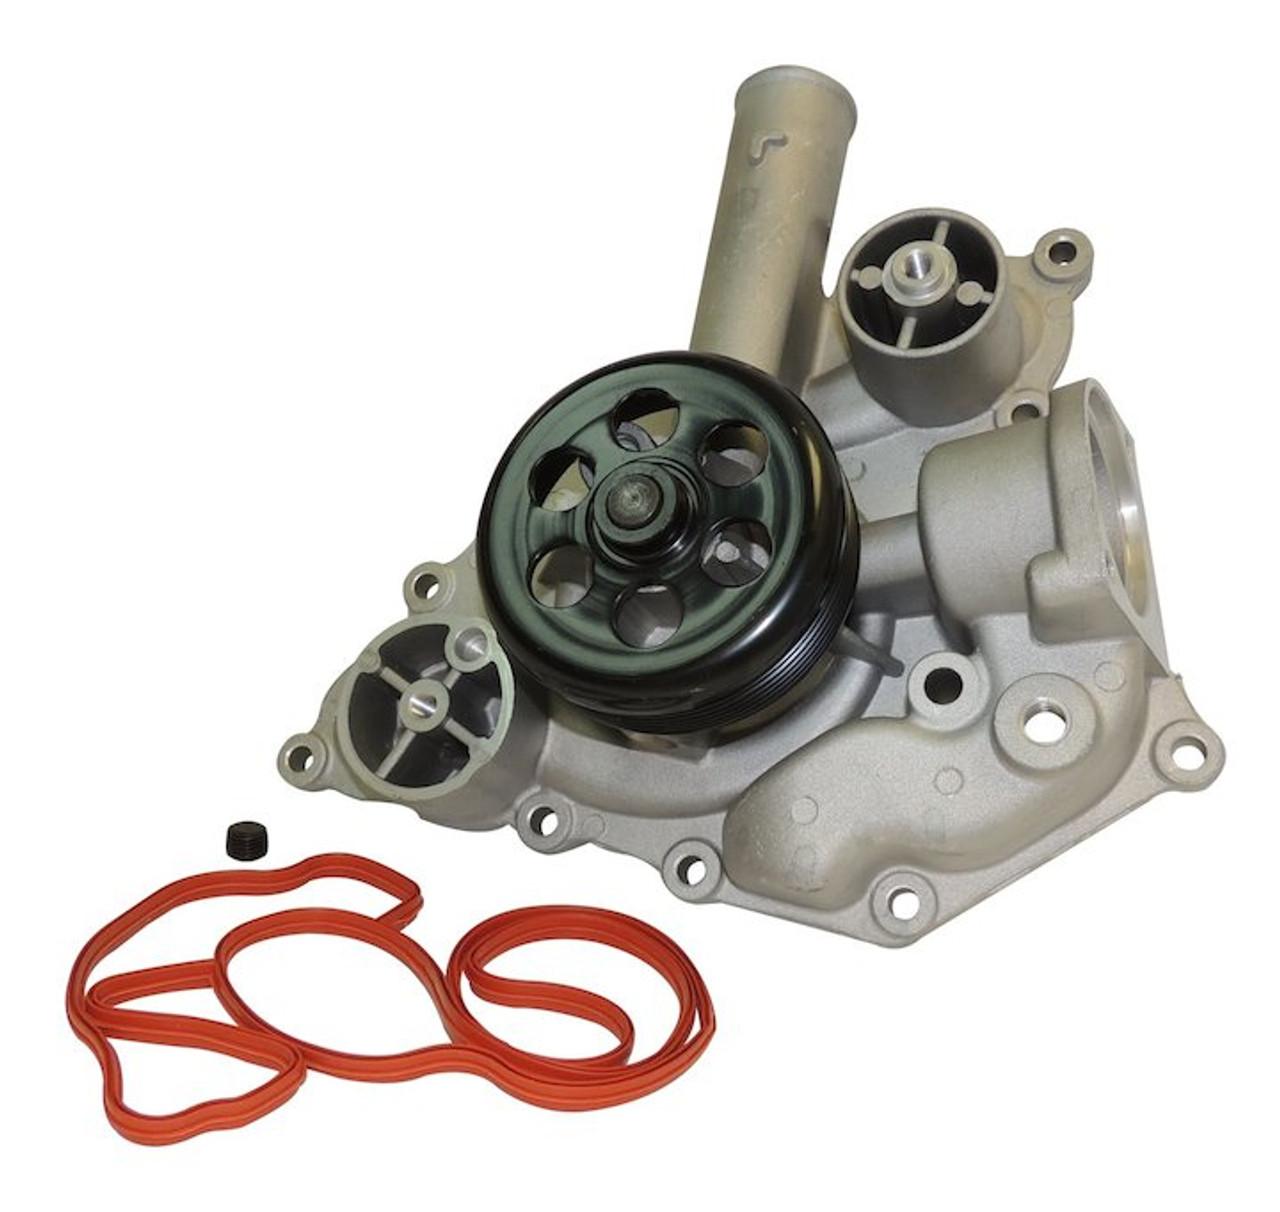 Water Pump (4792838AB) fits { LC } Dodge Challenger (2008-2014), { LX }  Dodge Charger (2006-2010), { LX } Dodge Magnum (2005-2010), { LX } Chrysler